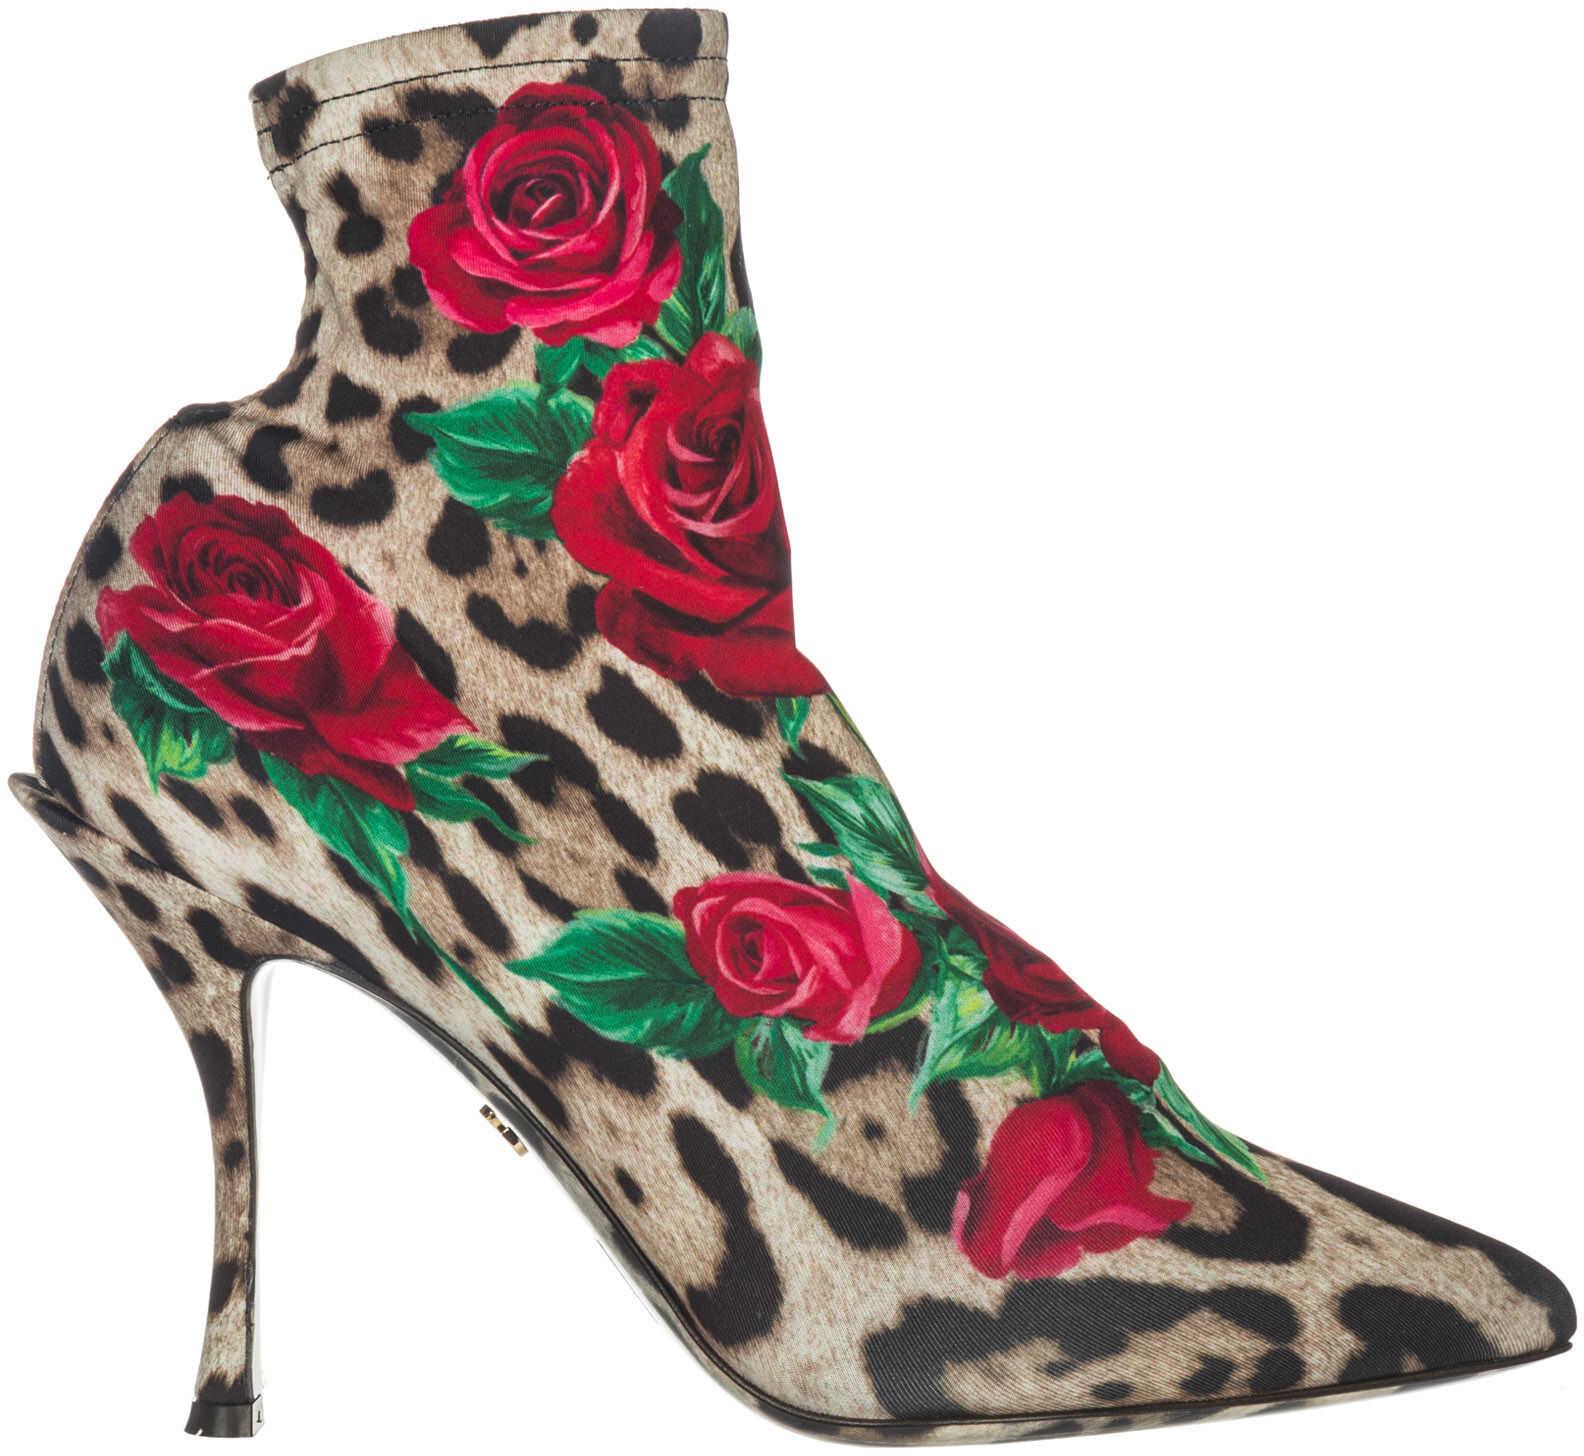 Dolce & Gabbana Booties Lori Brown